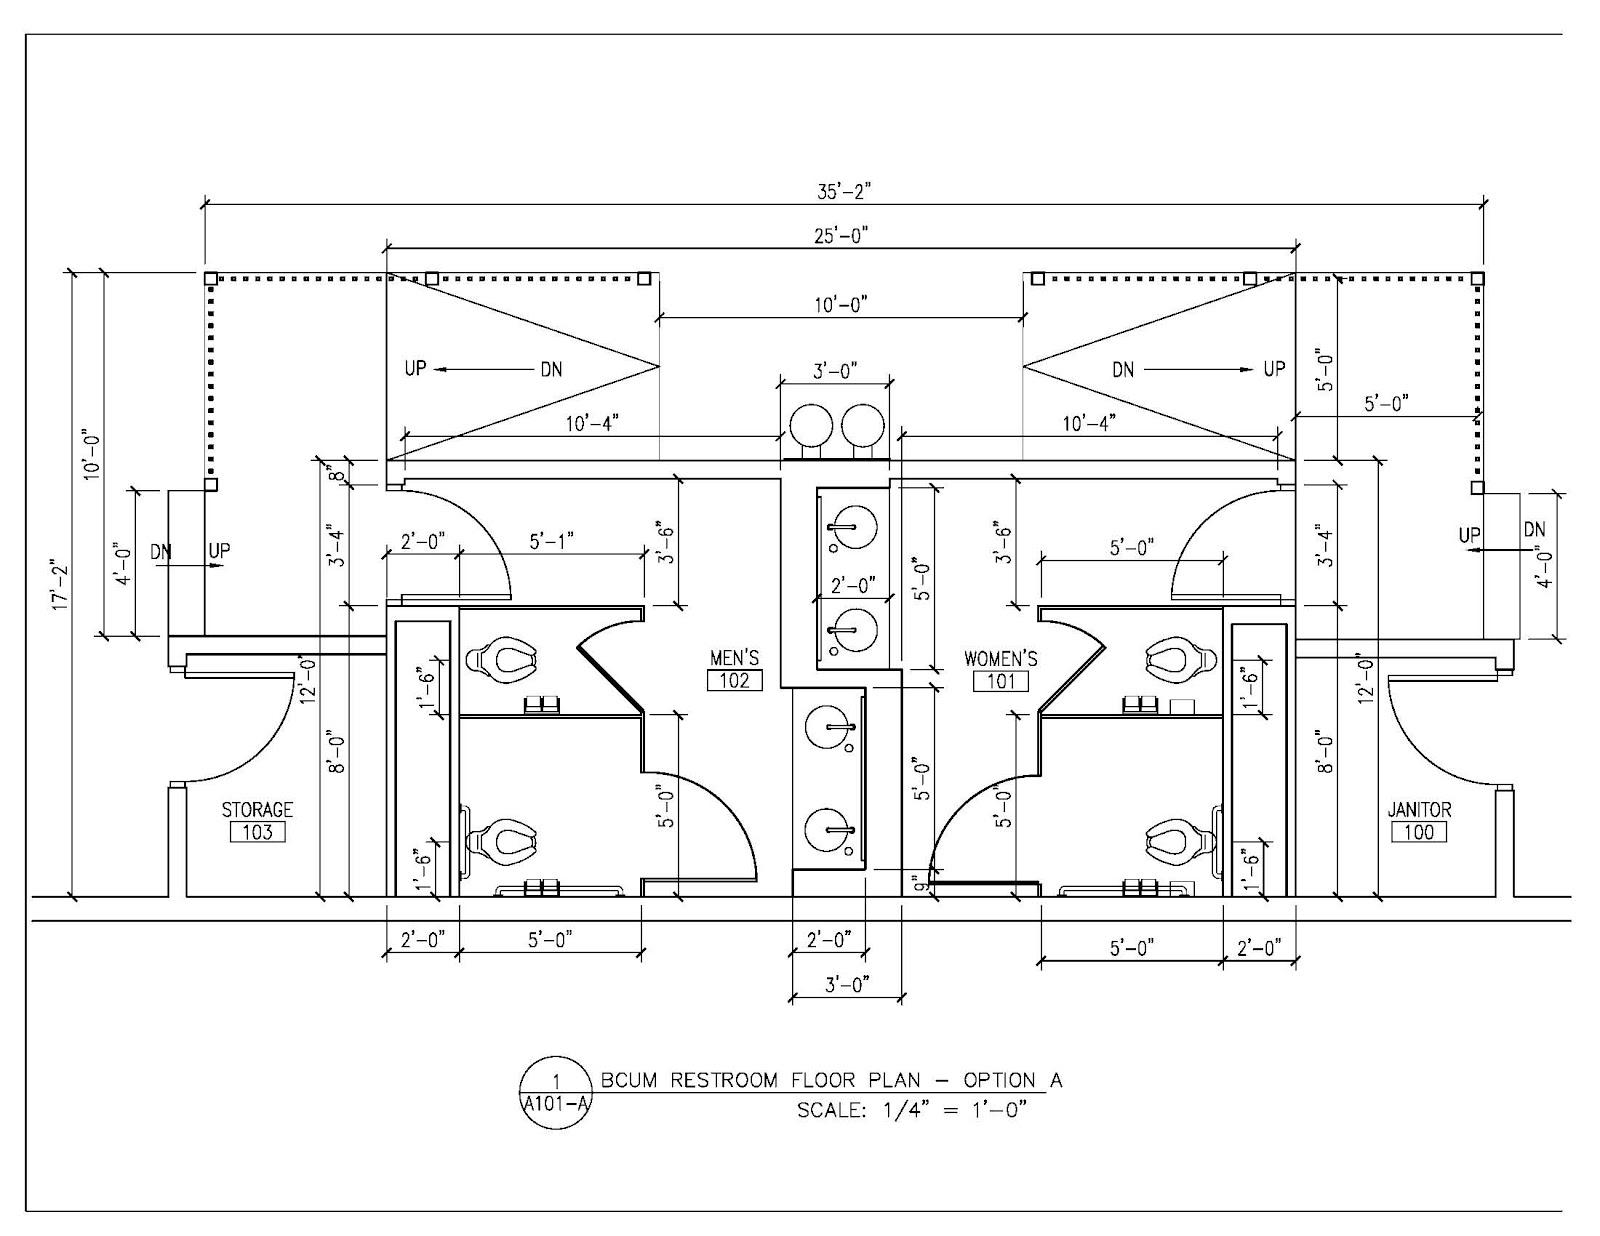 Best 10 Bathroom Doors Size Design Decoration Of Ada. Standard Handicap Bathroom Stall Size   Thedancingparent com